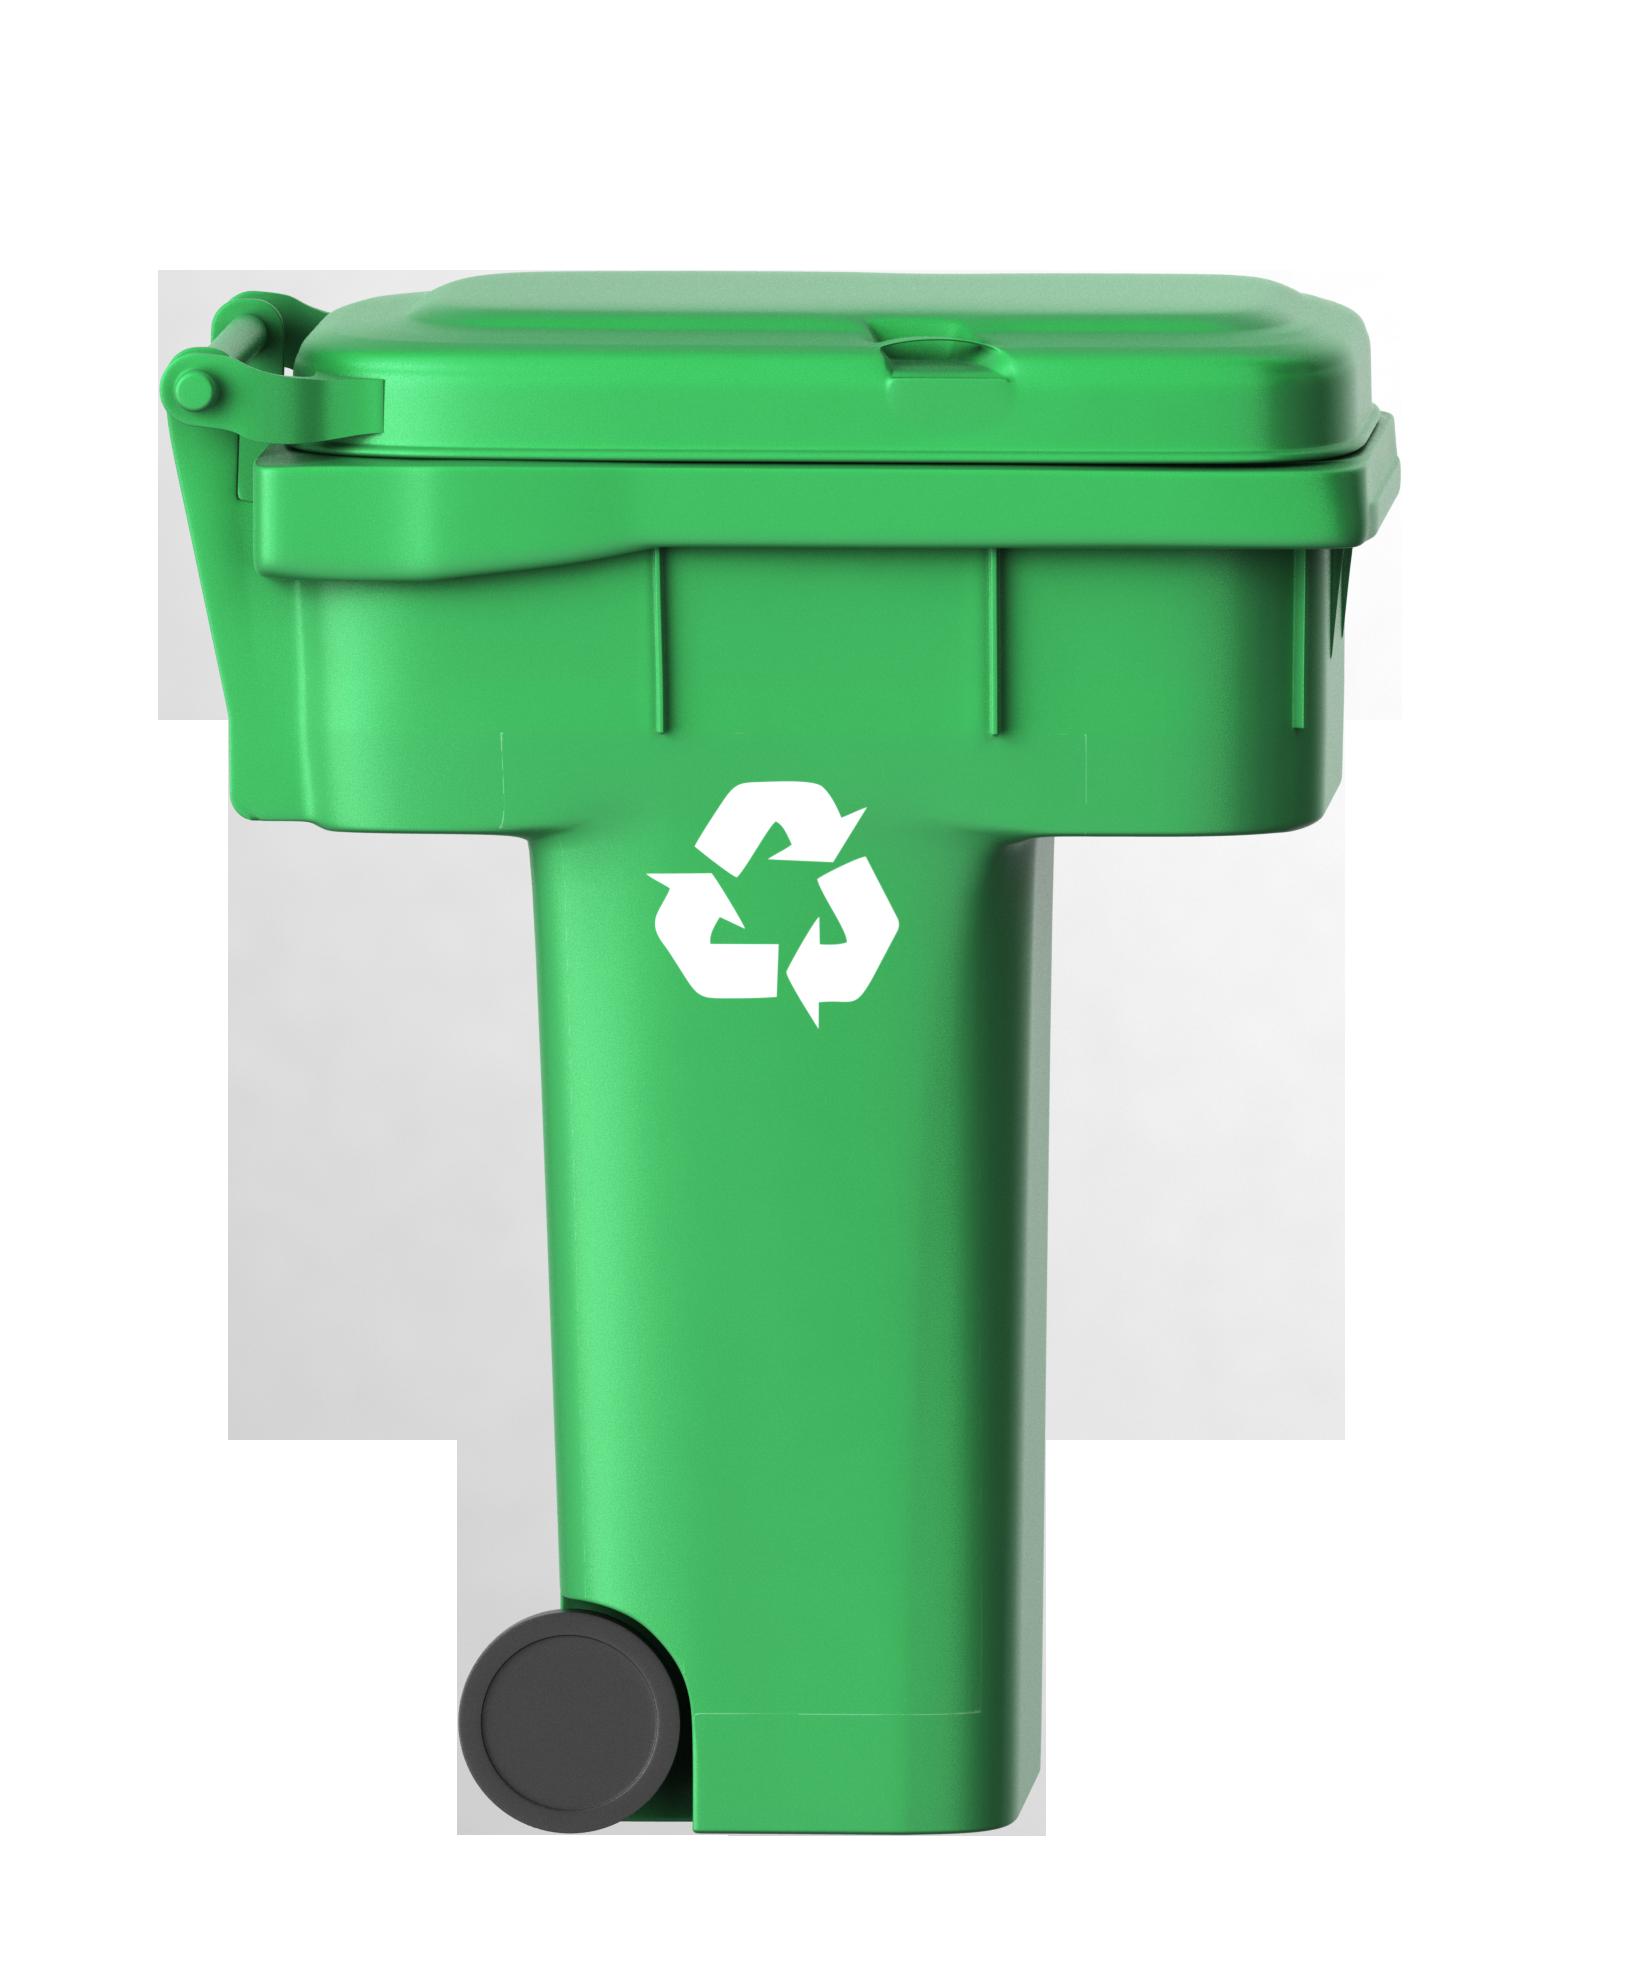 T_Recycle_bin.png